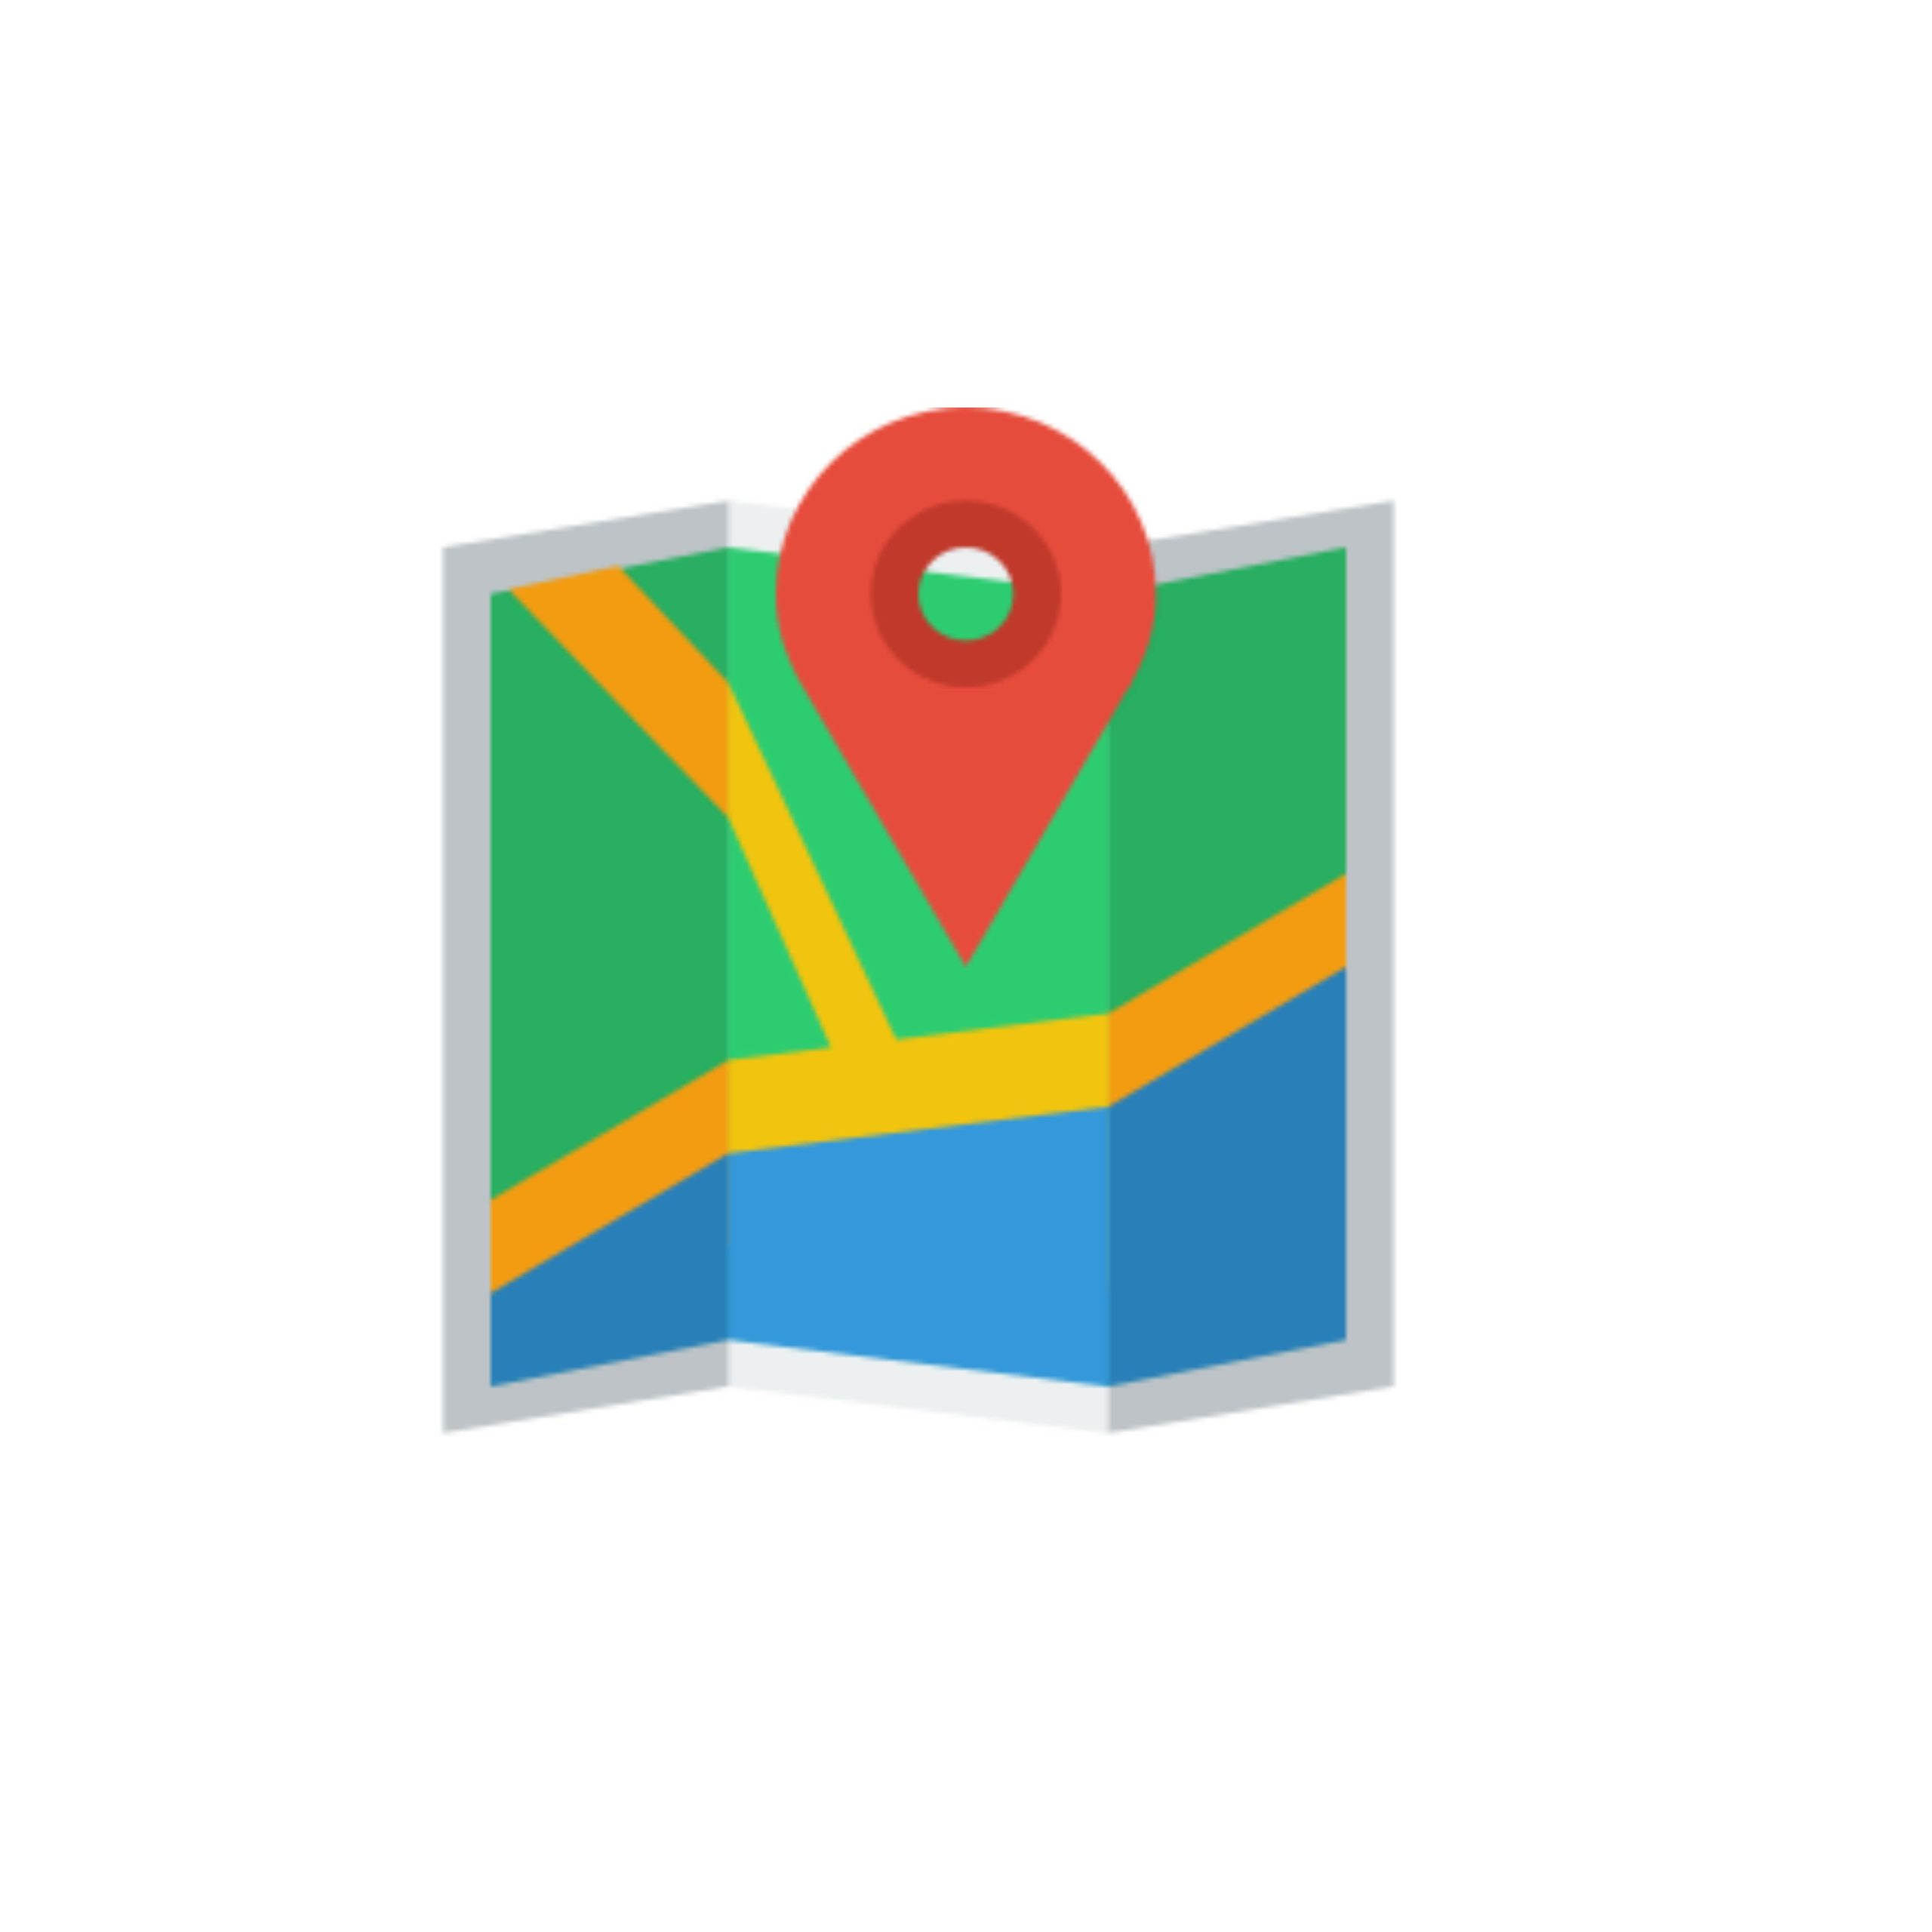 https://www.versero.de/wp-content/uploads/2020/01/Karte-suche-platz-scaled.jpg